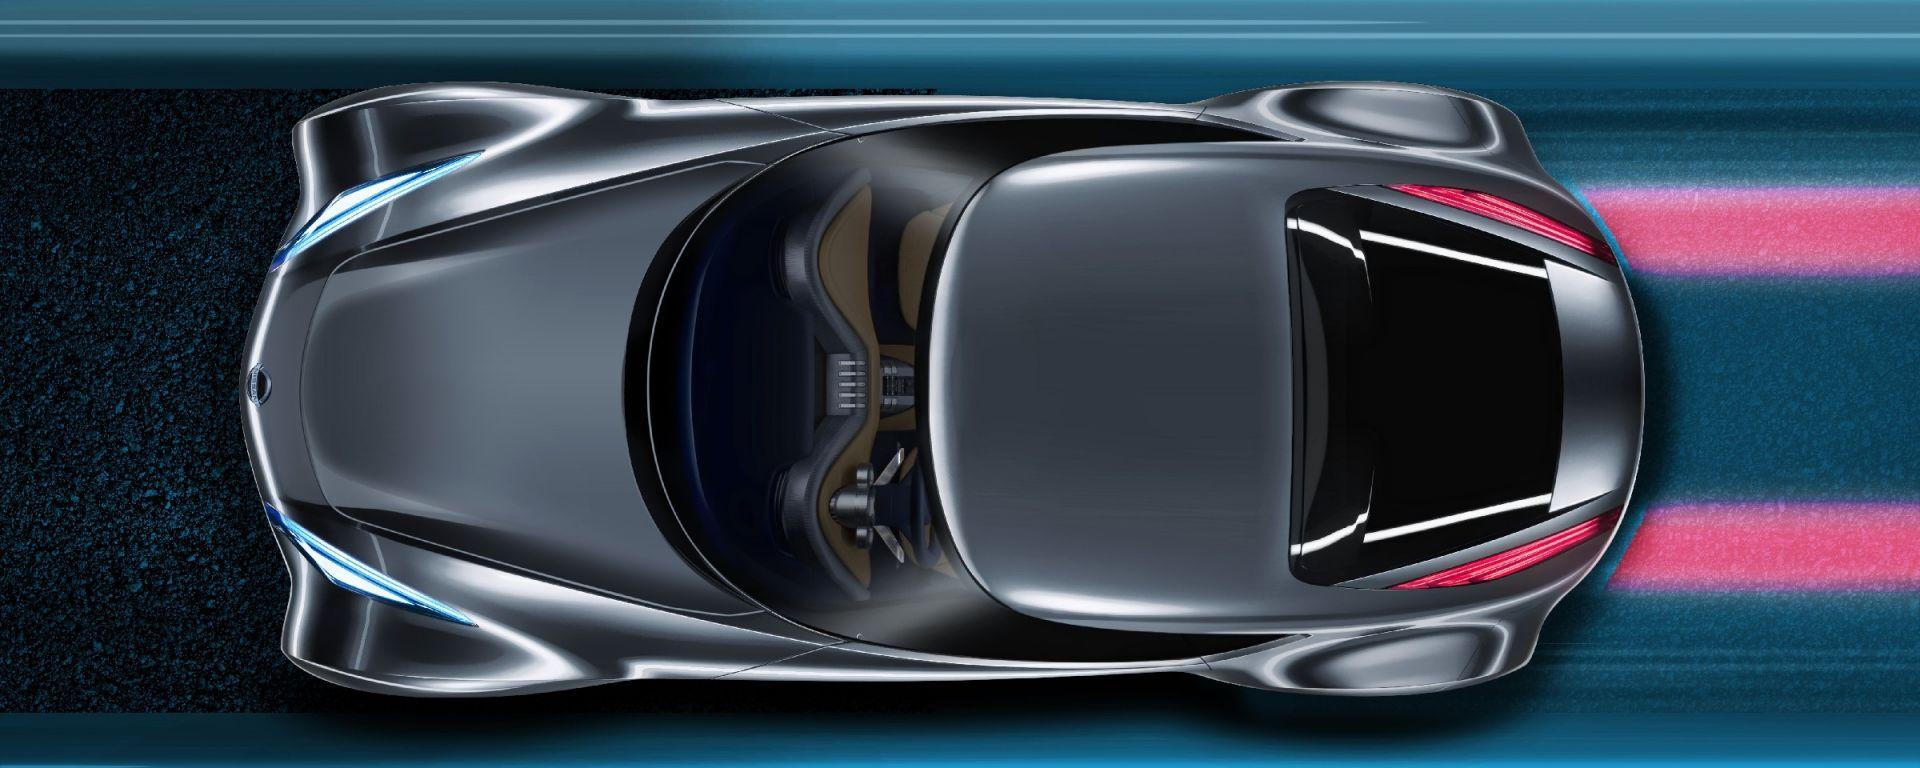 Nissan ESFLOW: le nuove immagini in HD